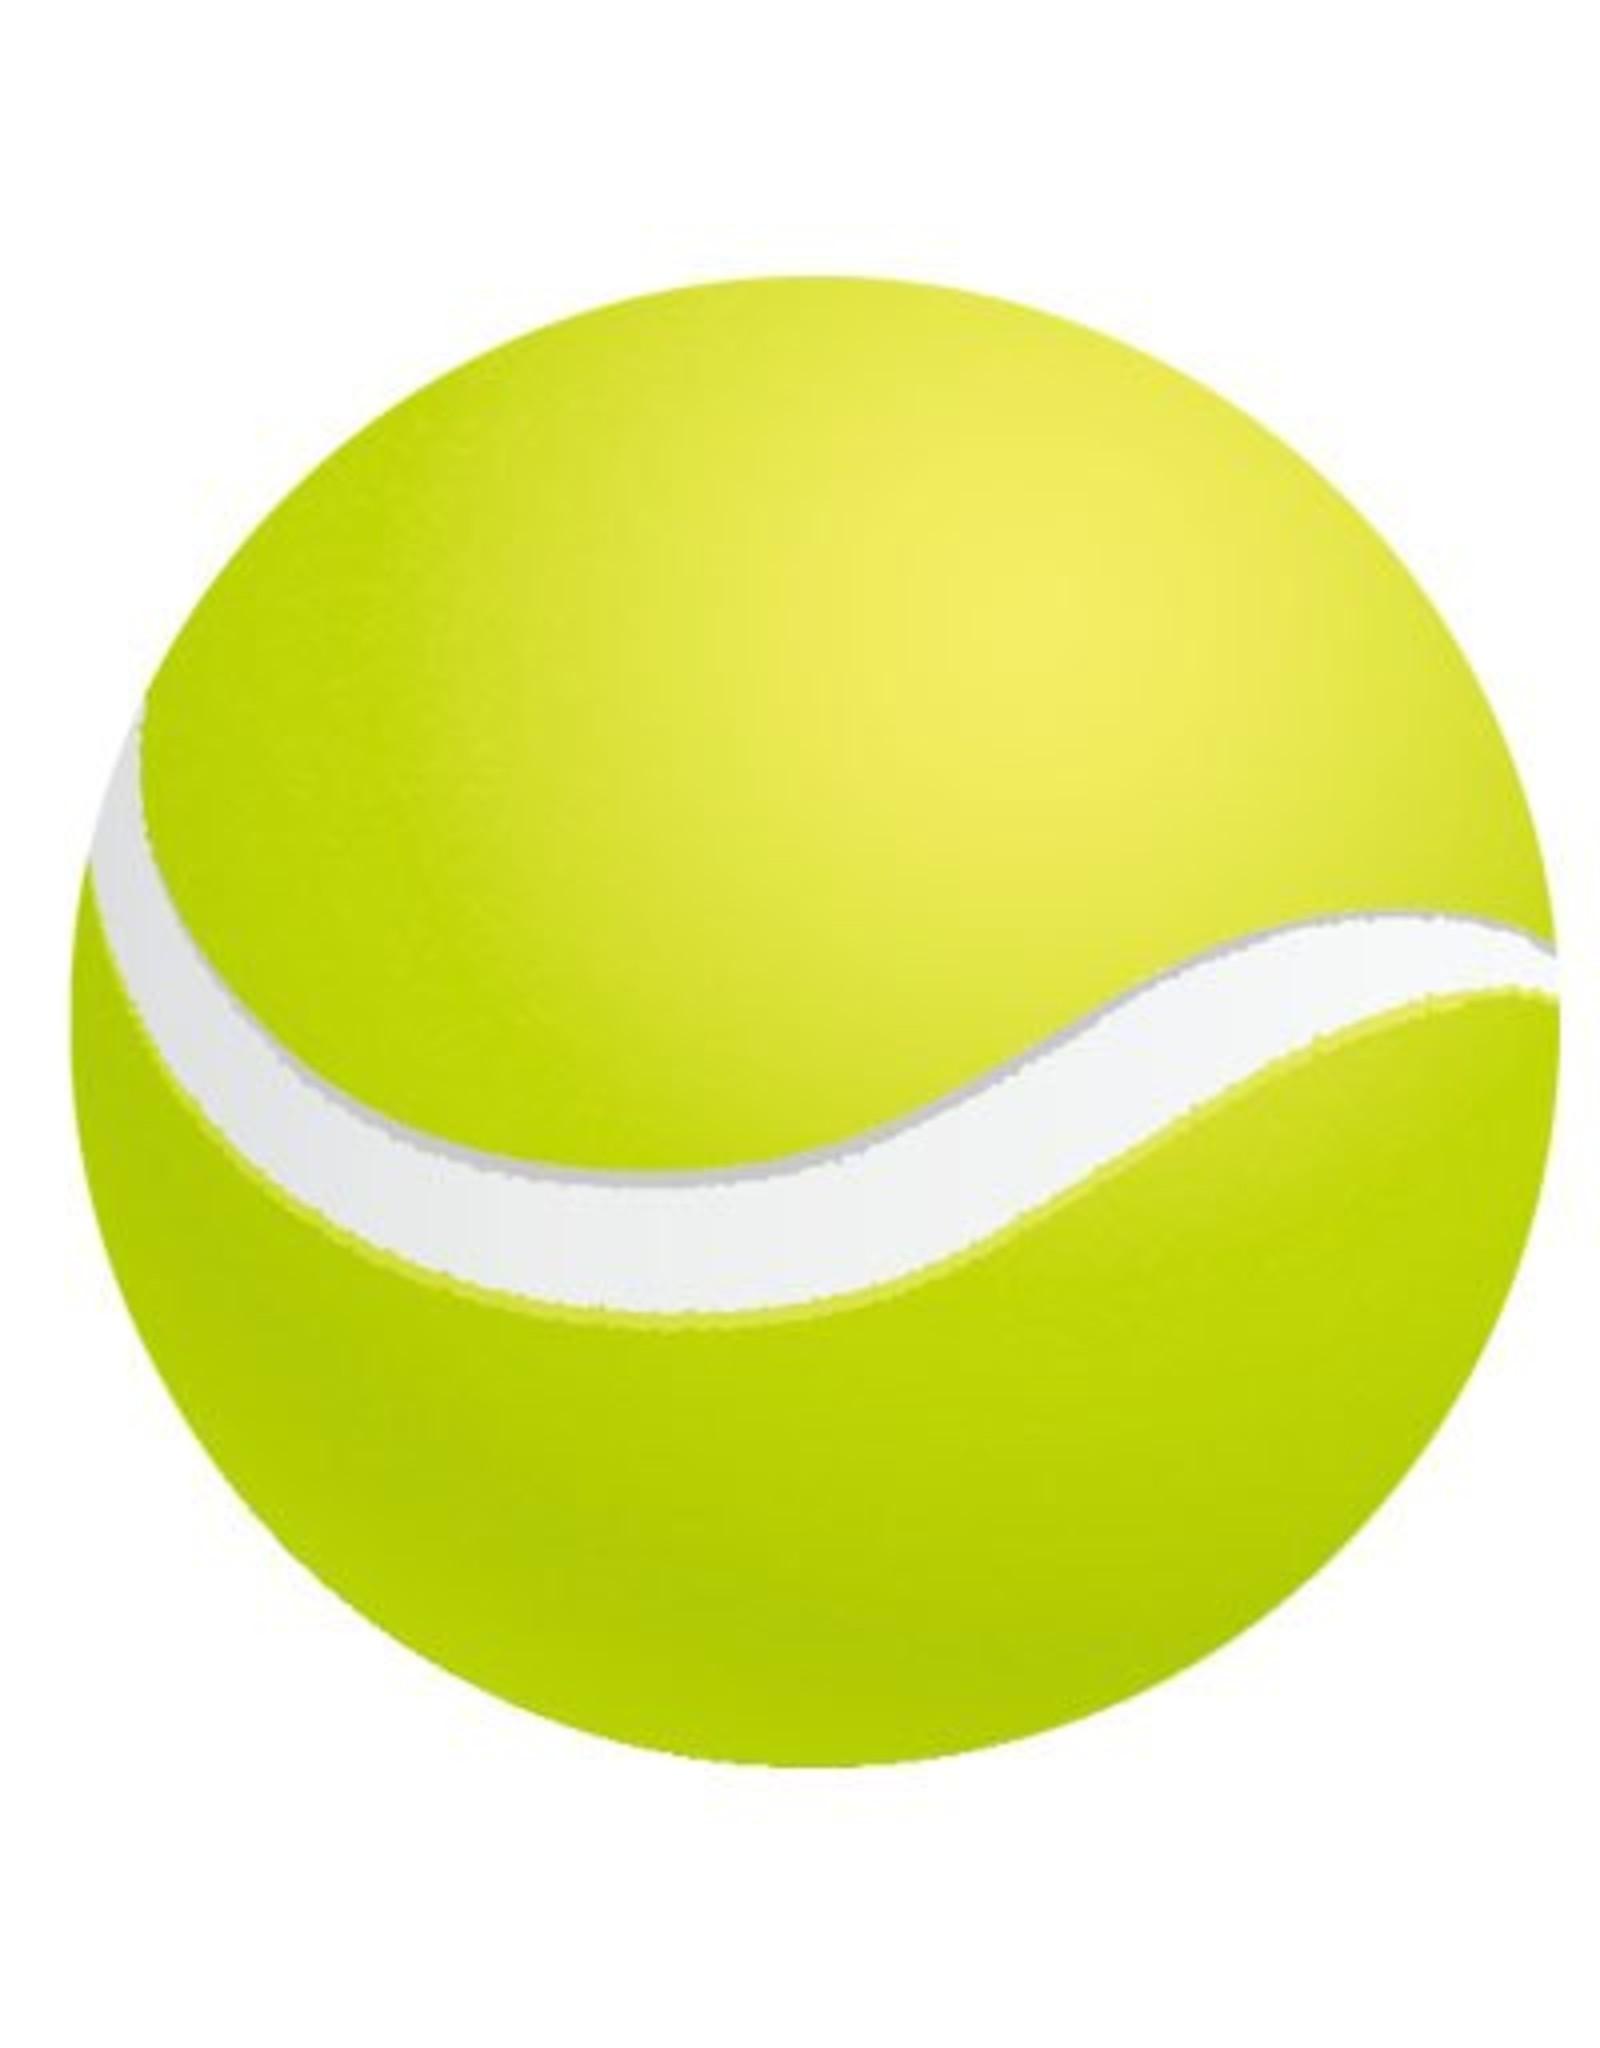 Telefoonbutton 'Tennisbal 1' - Body & Soap